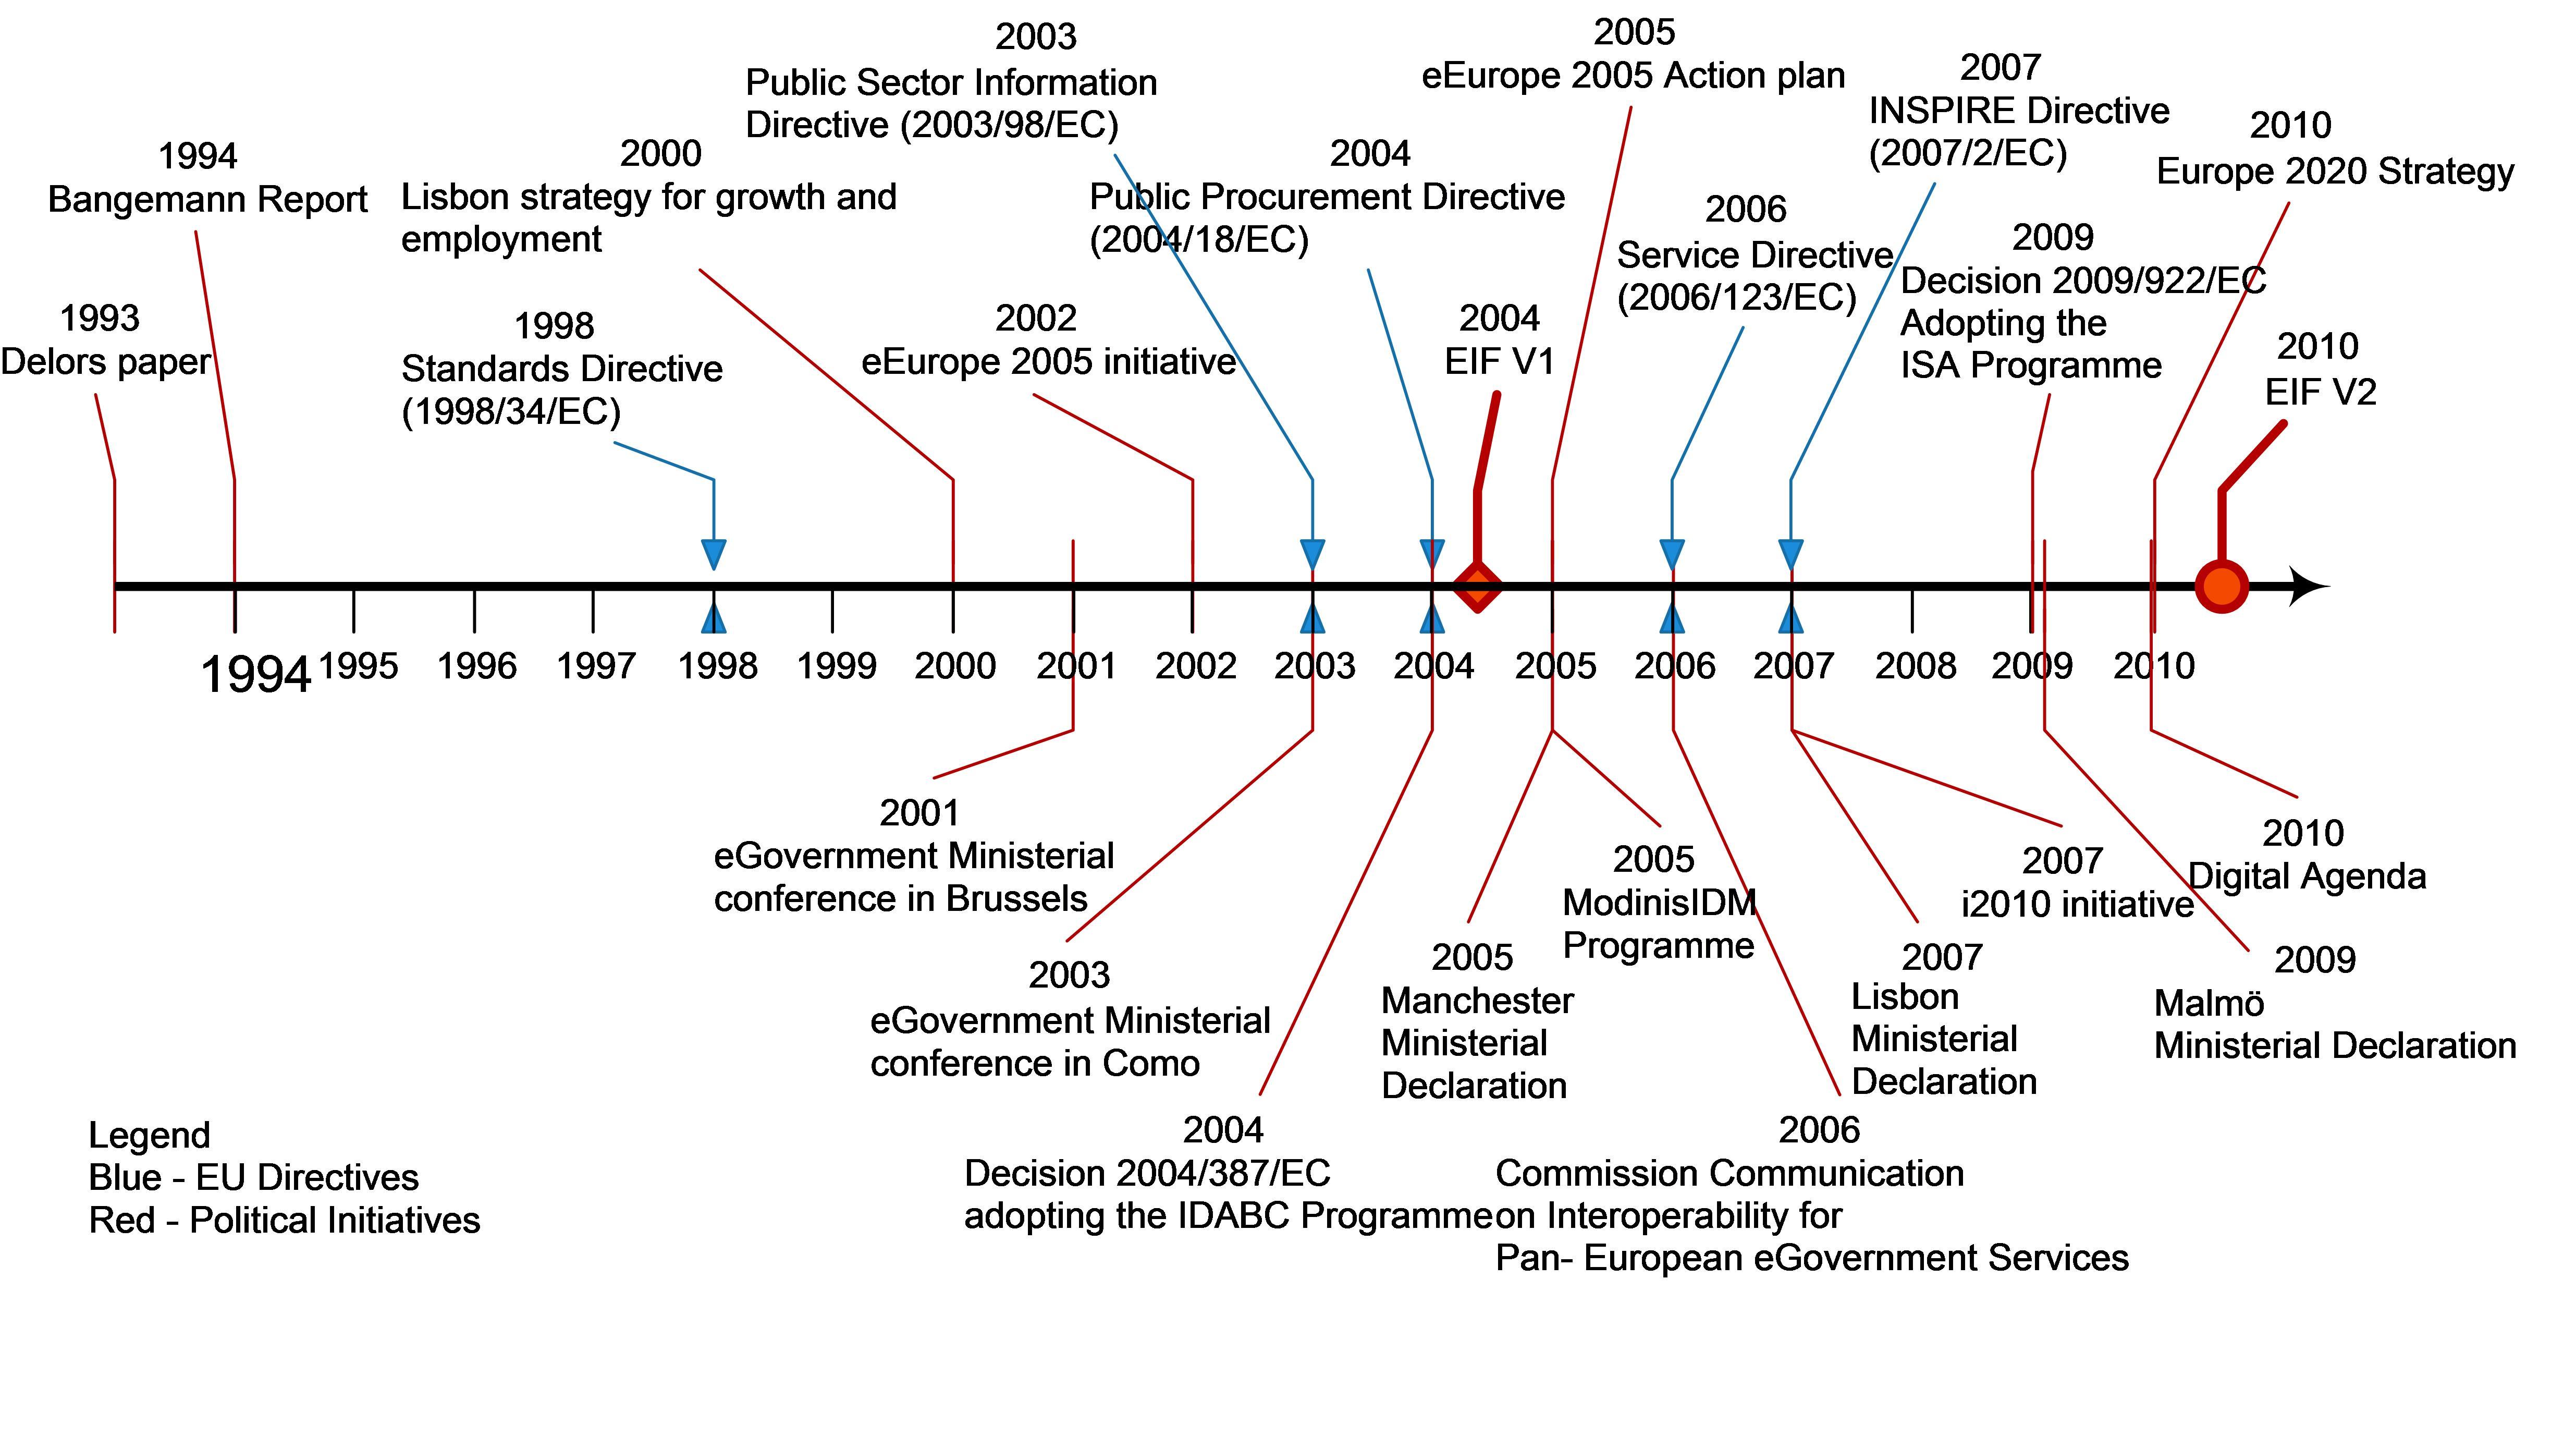 Eur Lex 52010dc0744 En Logic Diagram In Isa Format Timeline Of Eu Initiatives Concerning Interoperability